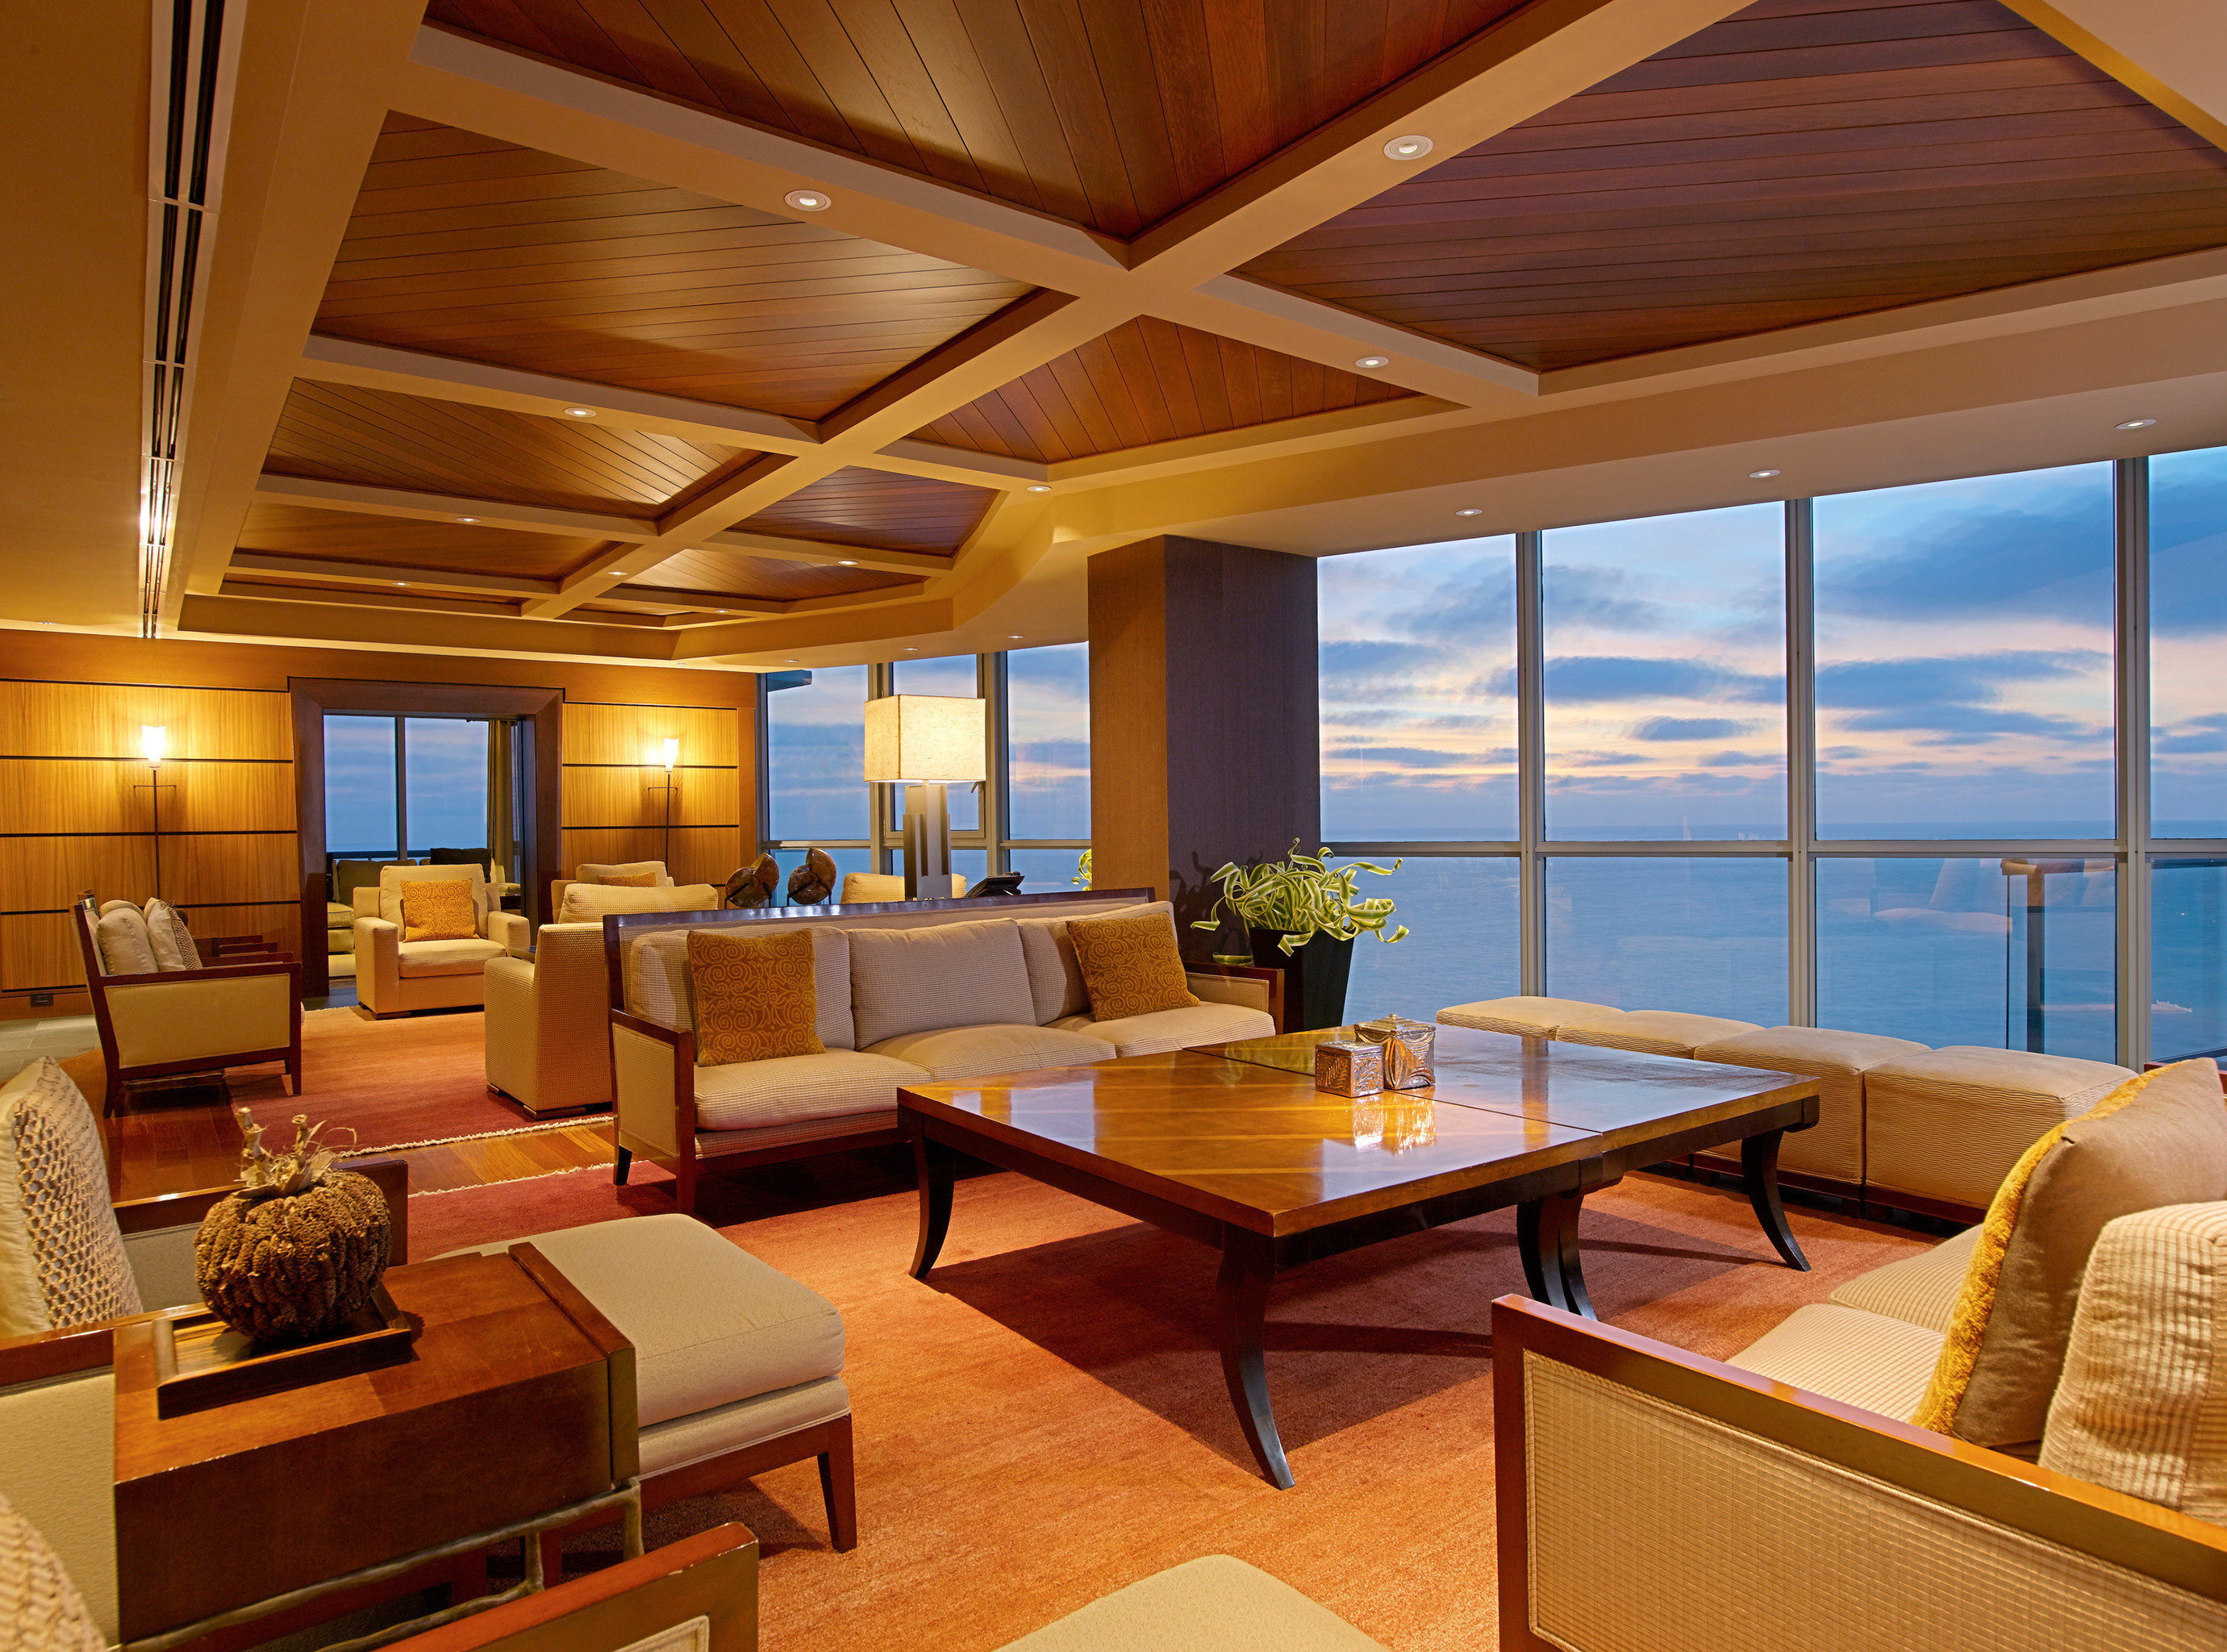 Hip Lounge Luxury Modern Scenic views property living room home Suite Resort yacht condominium Villa overlooking